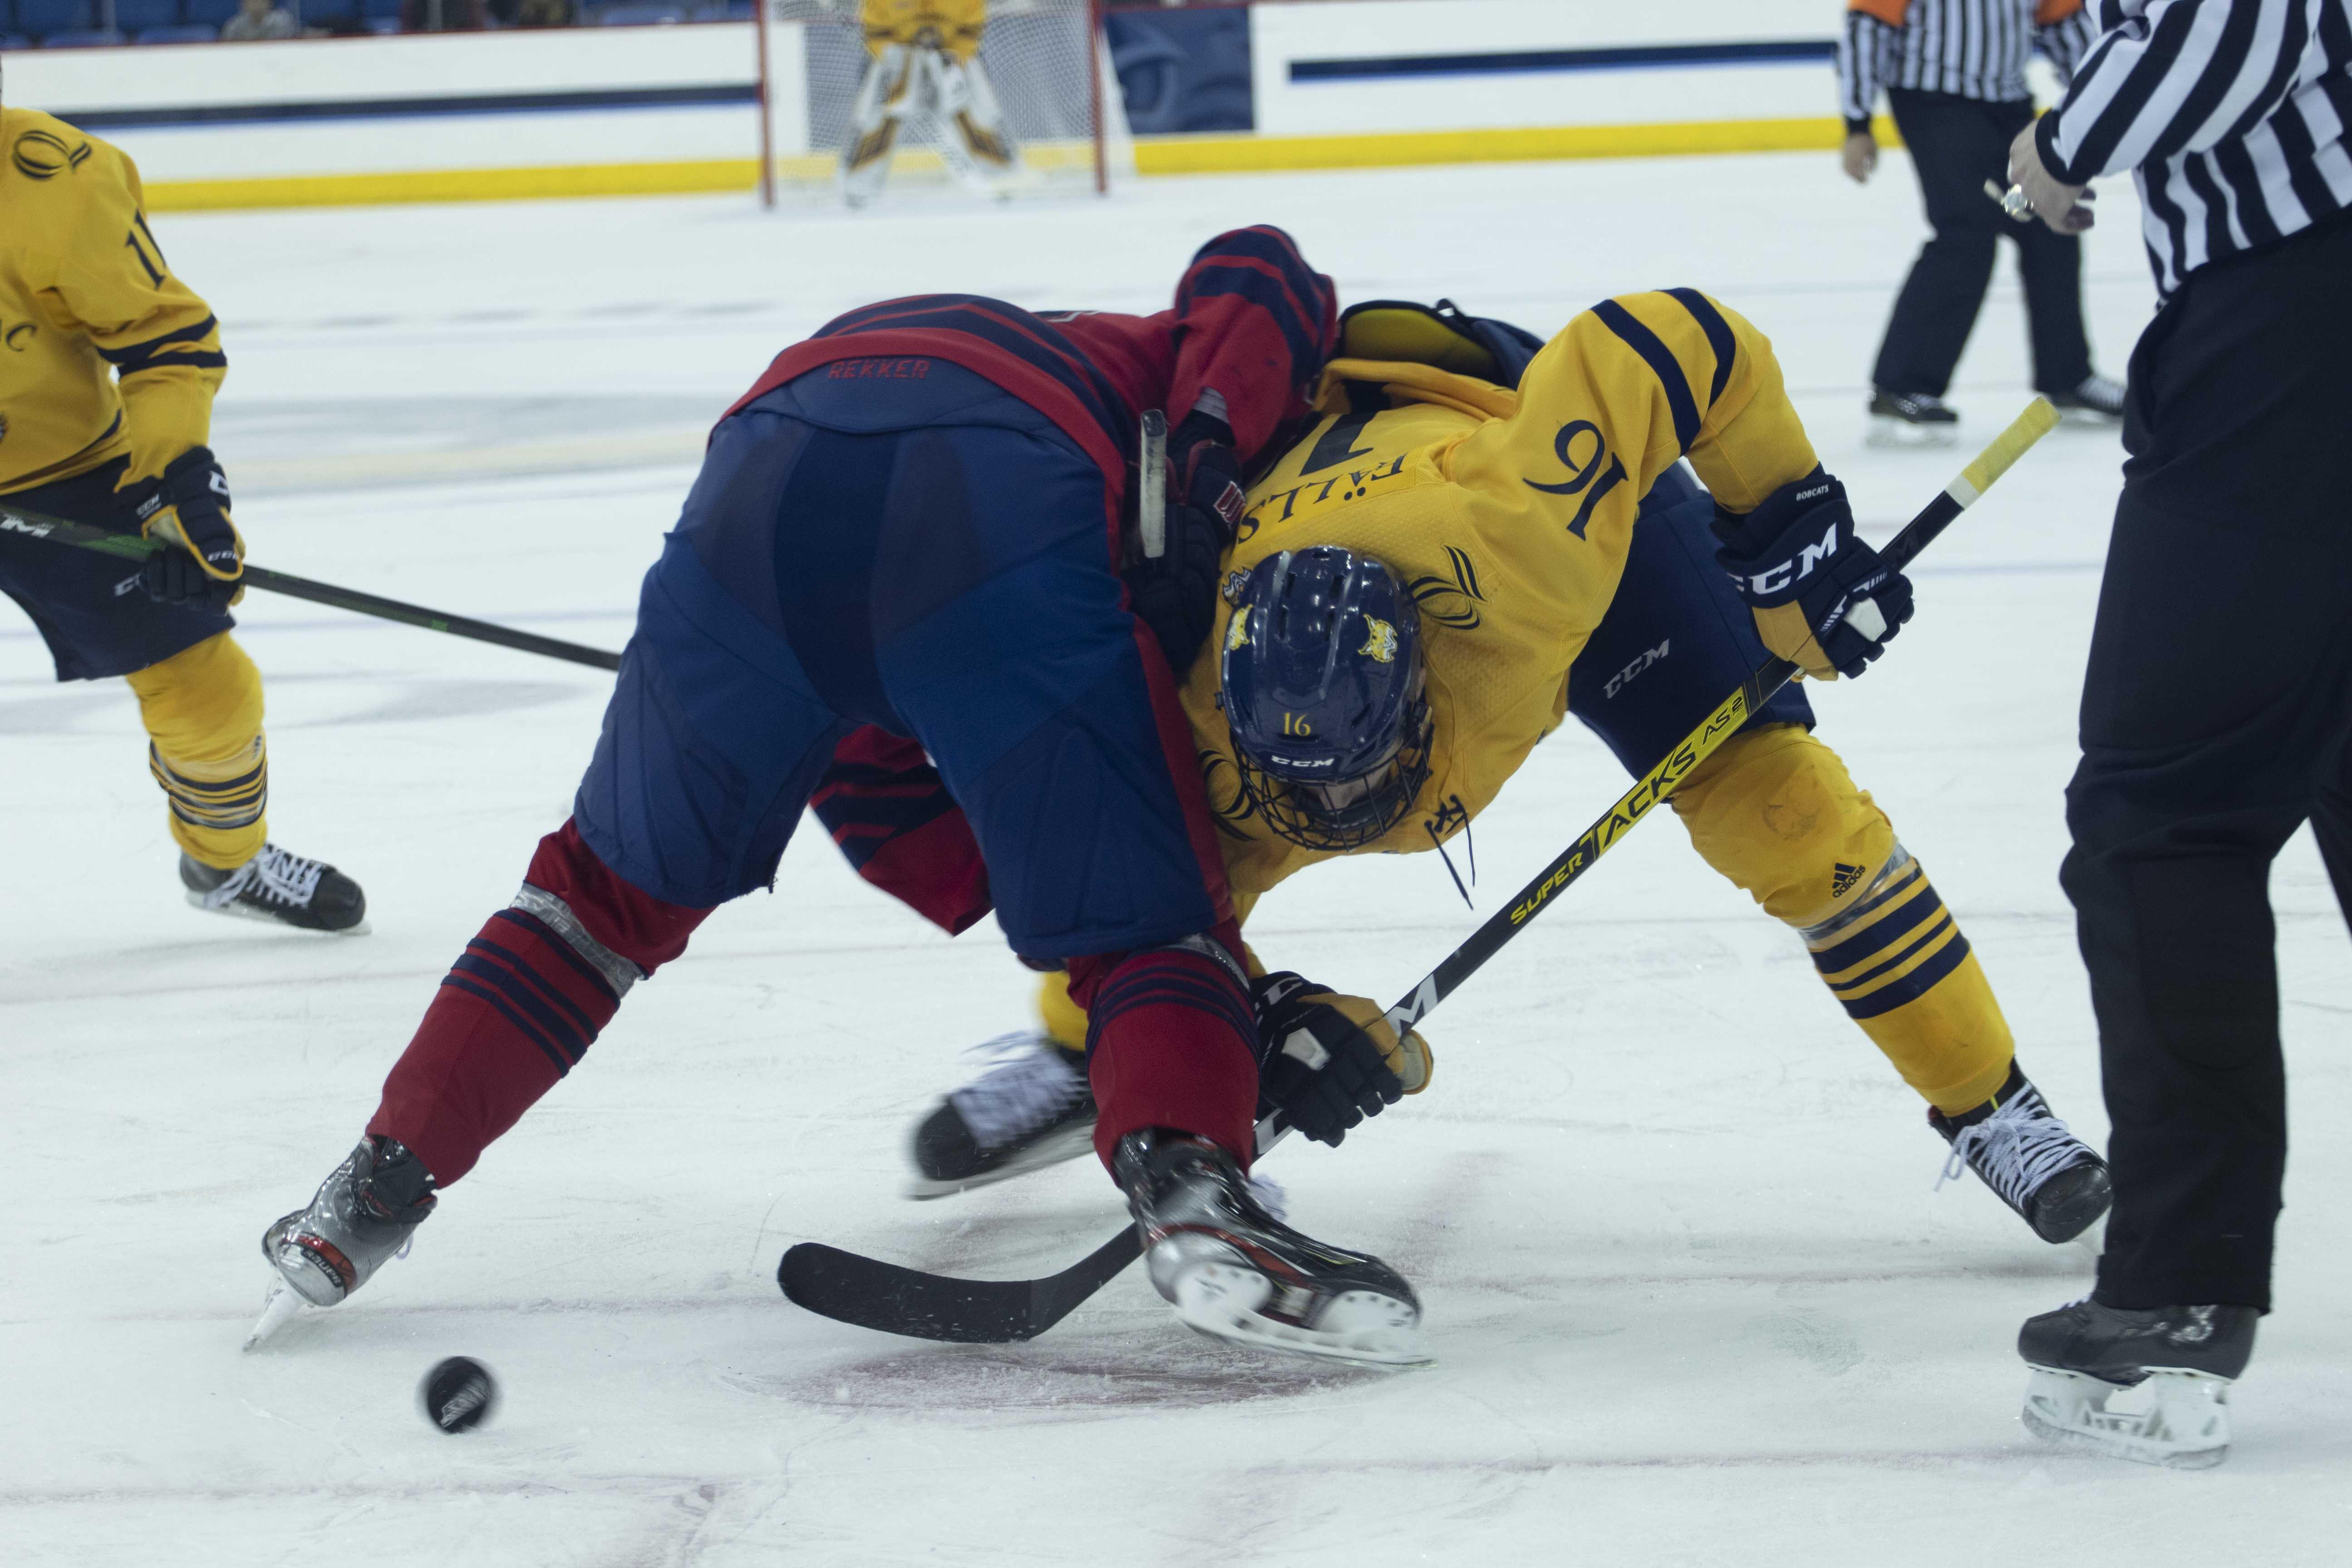 Quinnipiac men's ice hockey opens up season with chaotic 4-4 deadlock